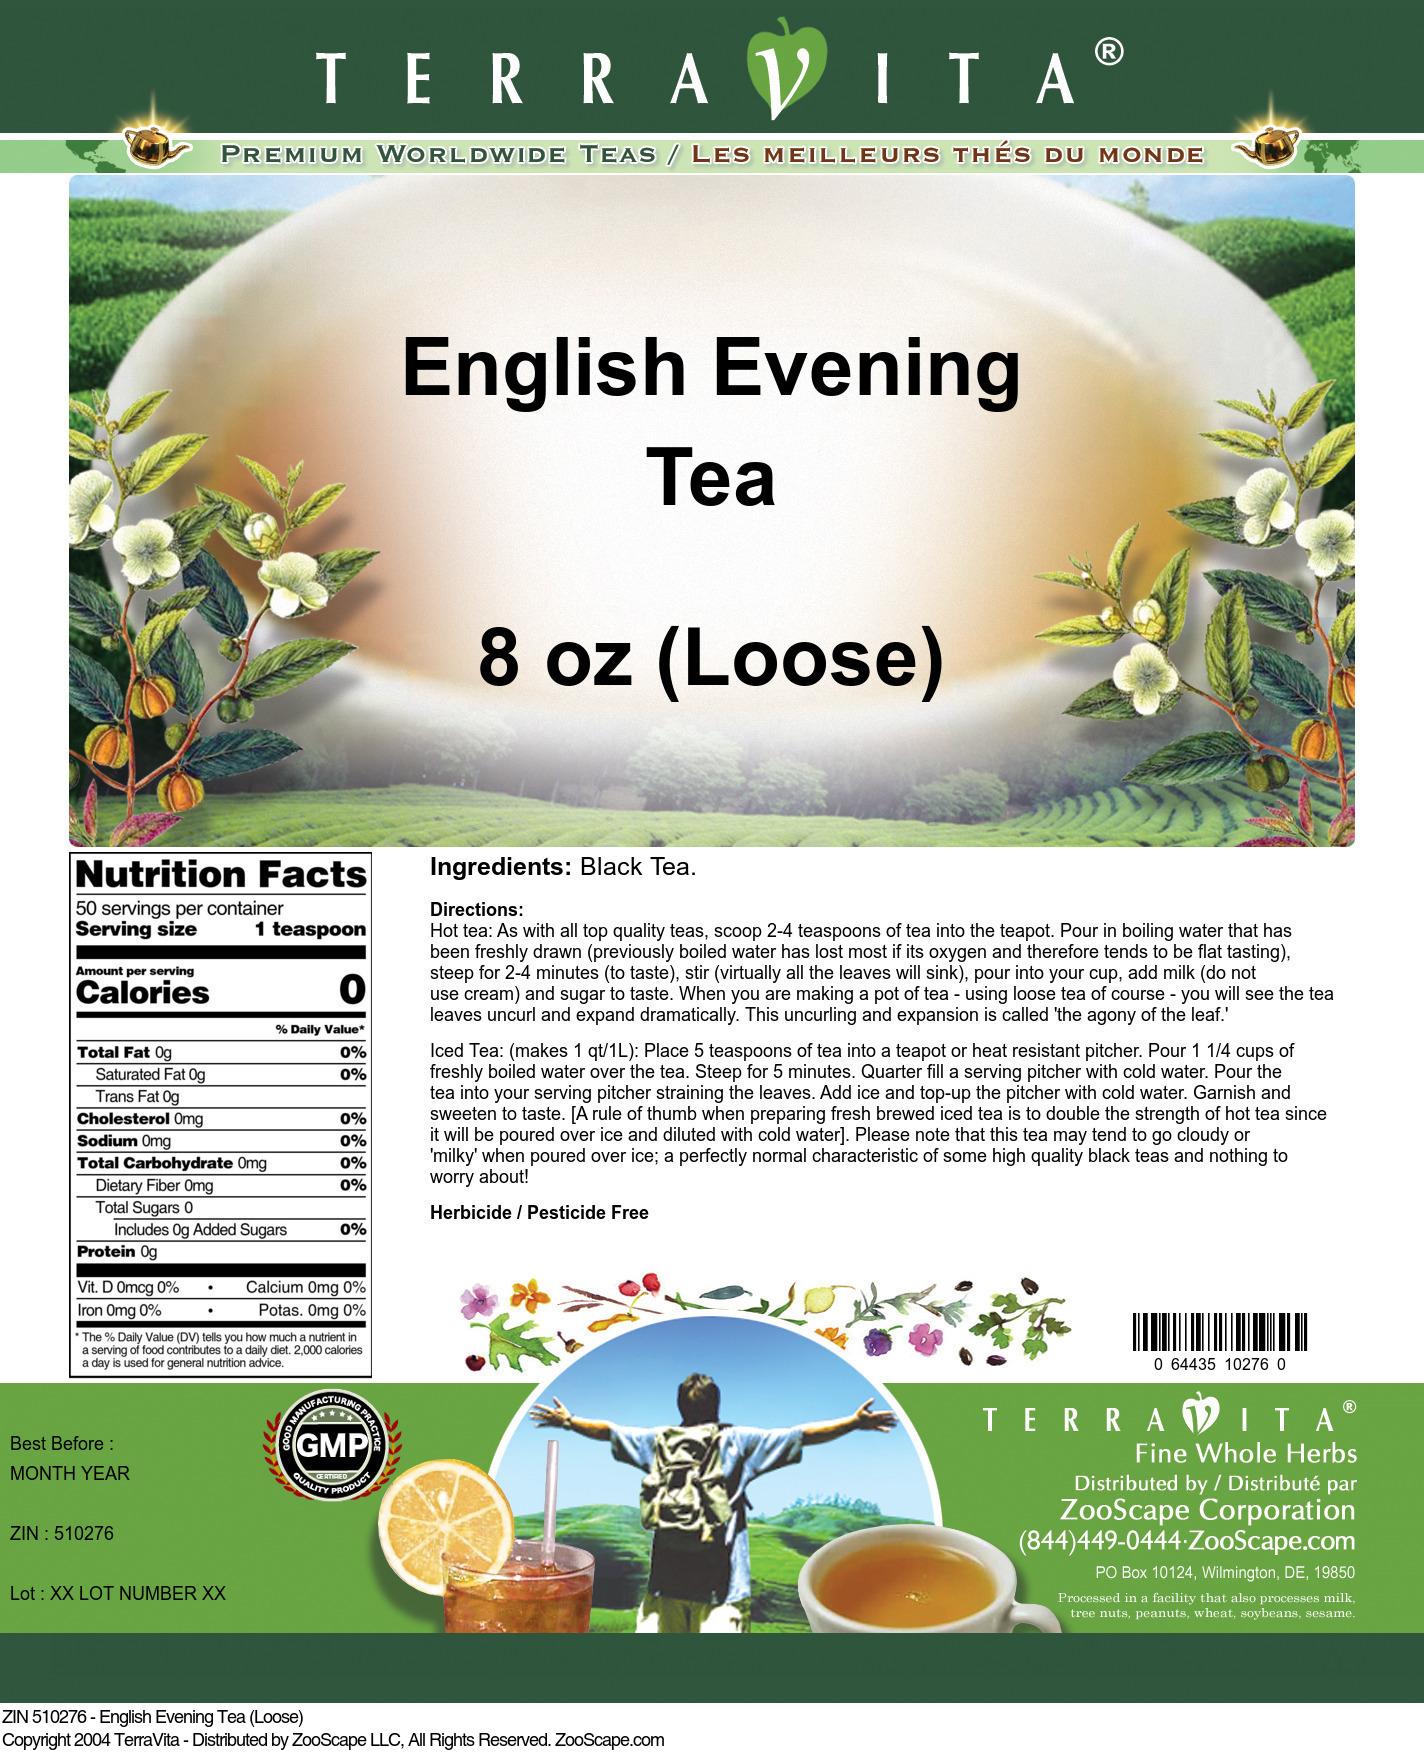 English Evening Tea (Loose)